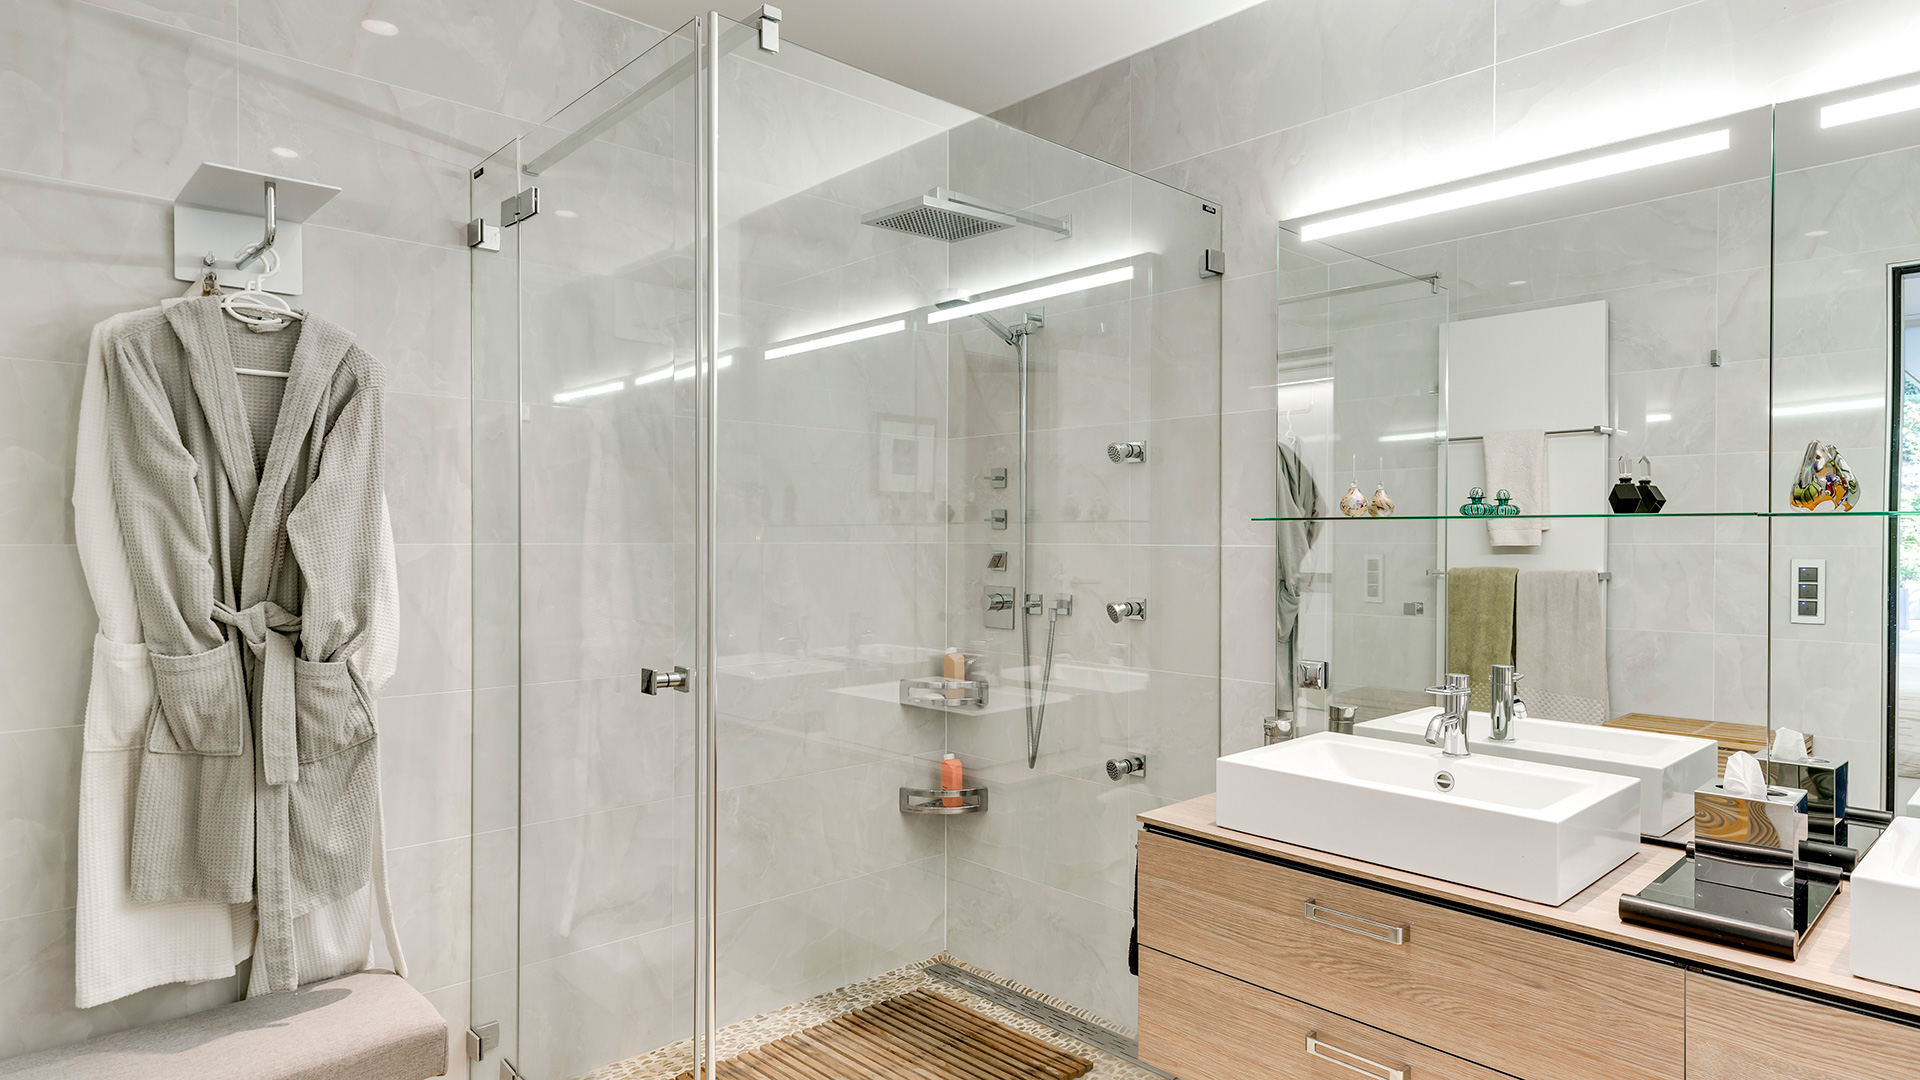 Oxalys B11 Apartments, Switzerland